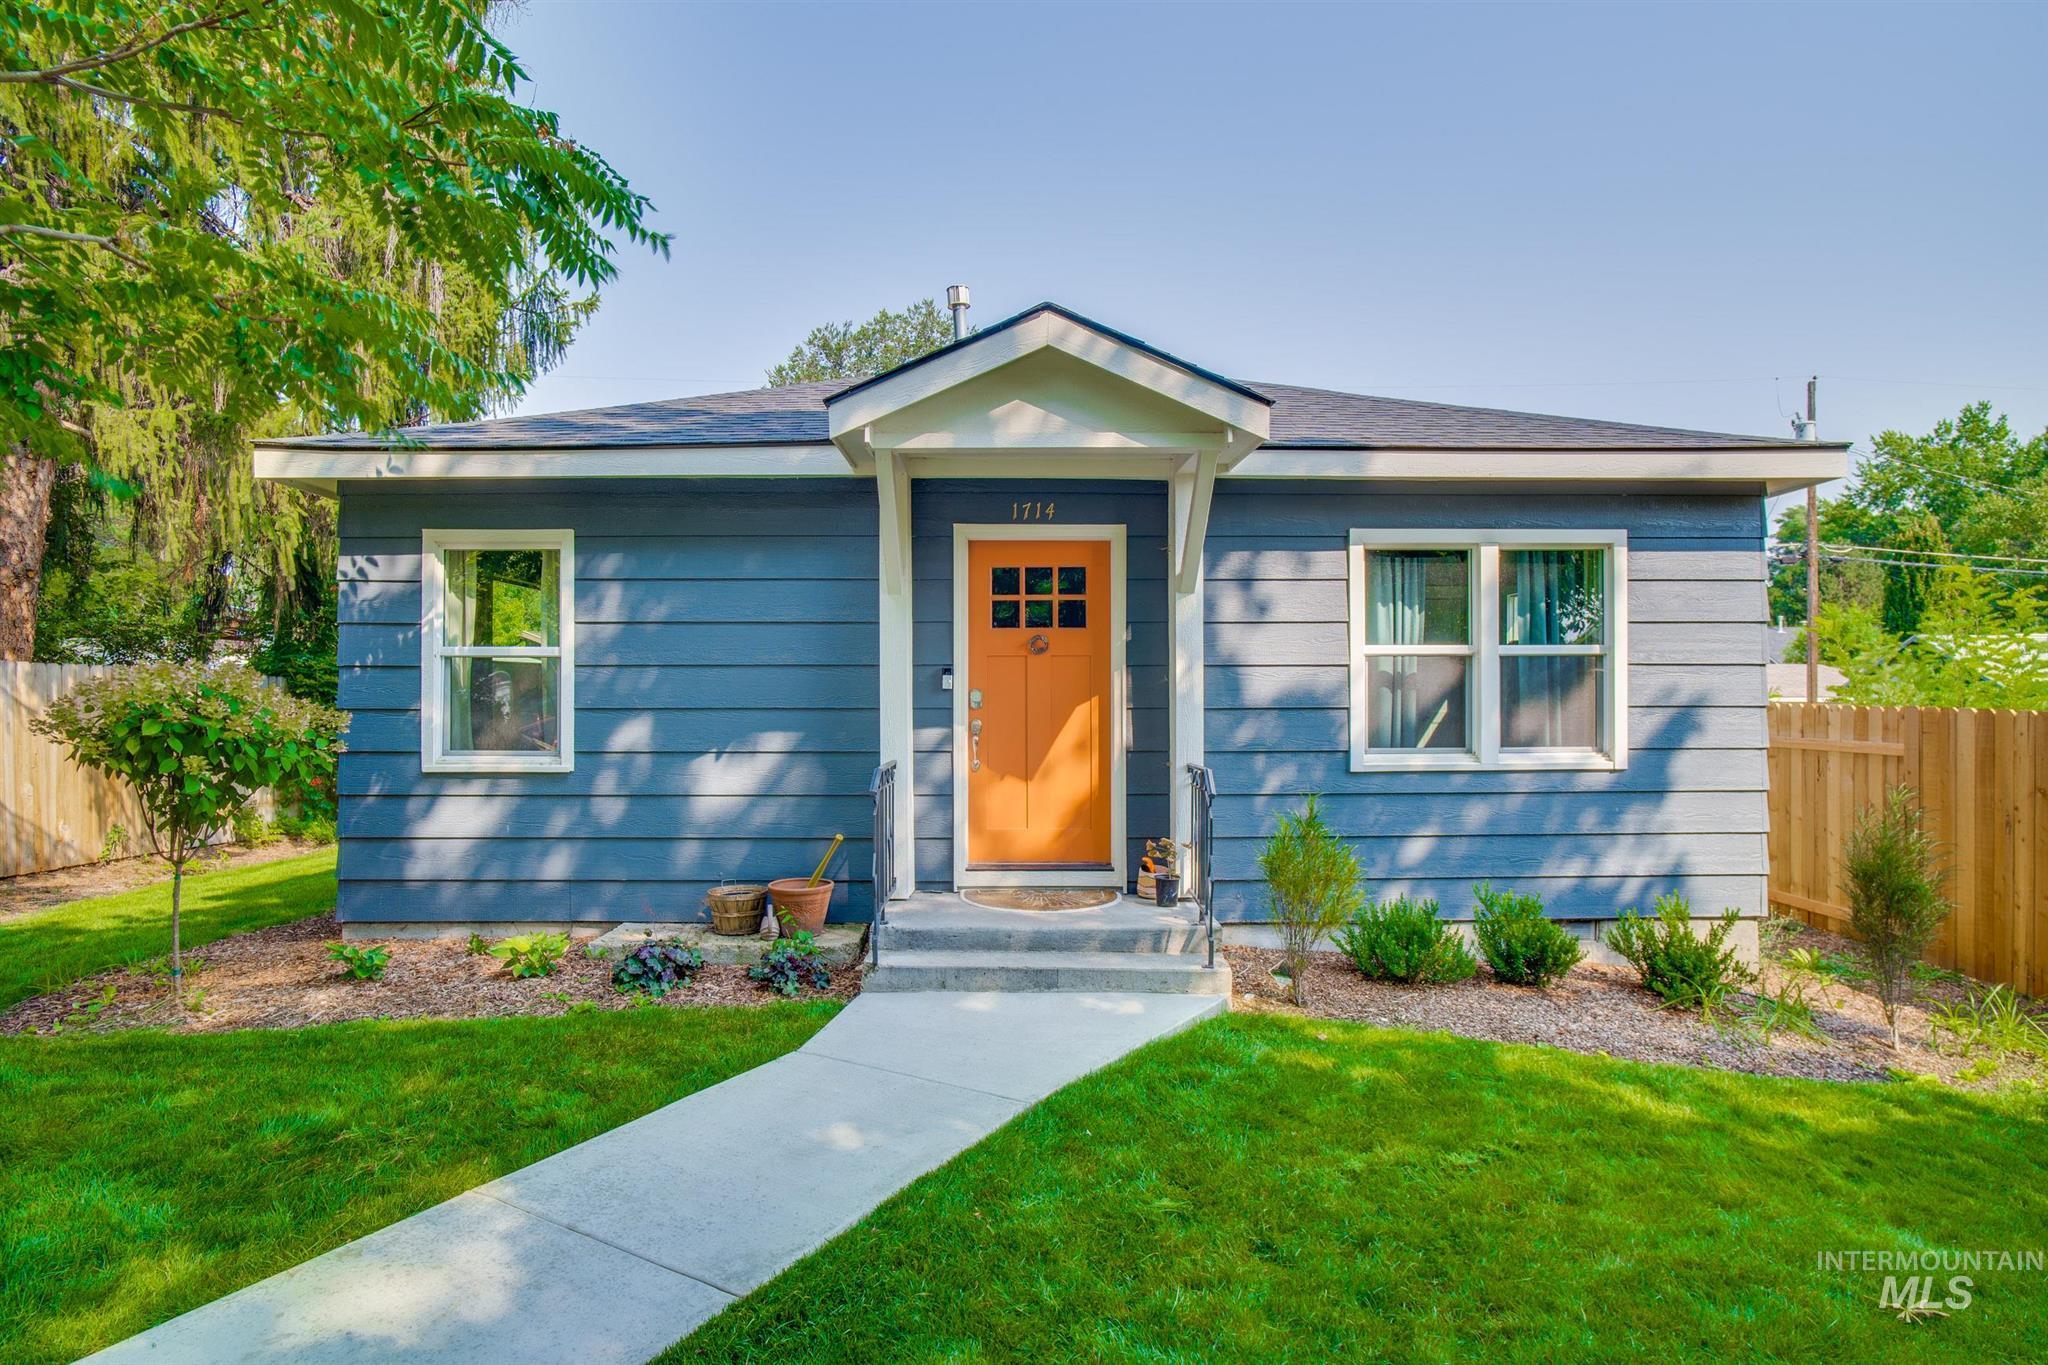 1714 N 27th Property Photo - Boise, ID real estate listing